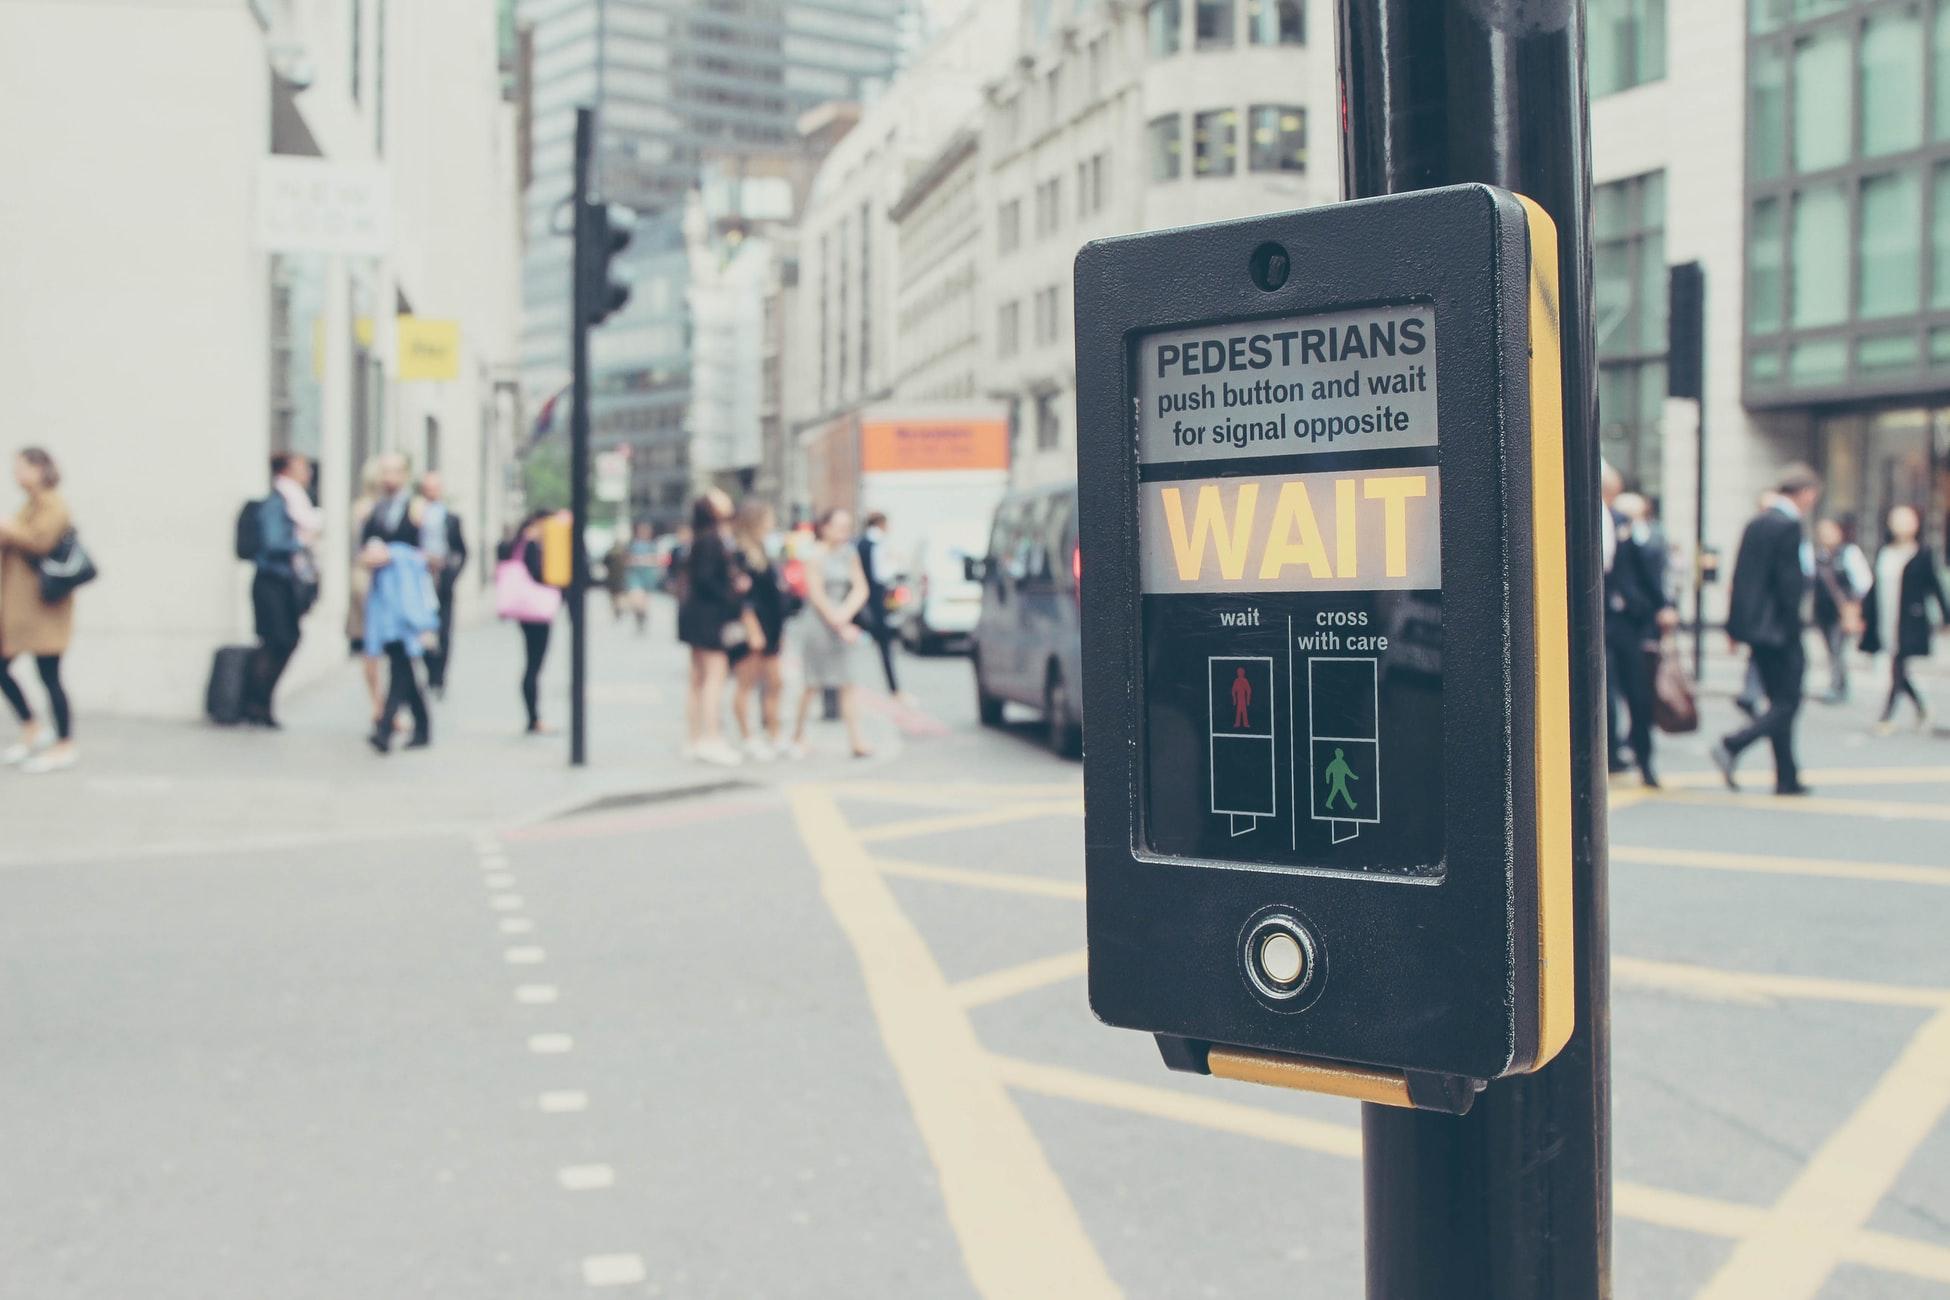 A crosswalk signal asking pedestrians to wait.